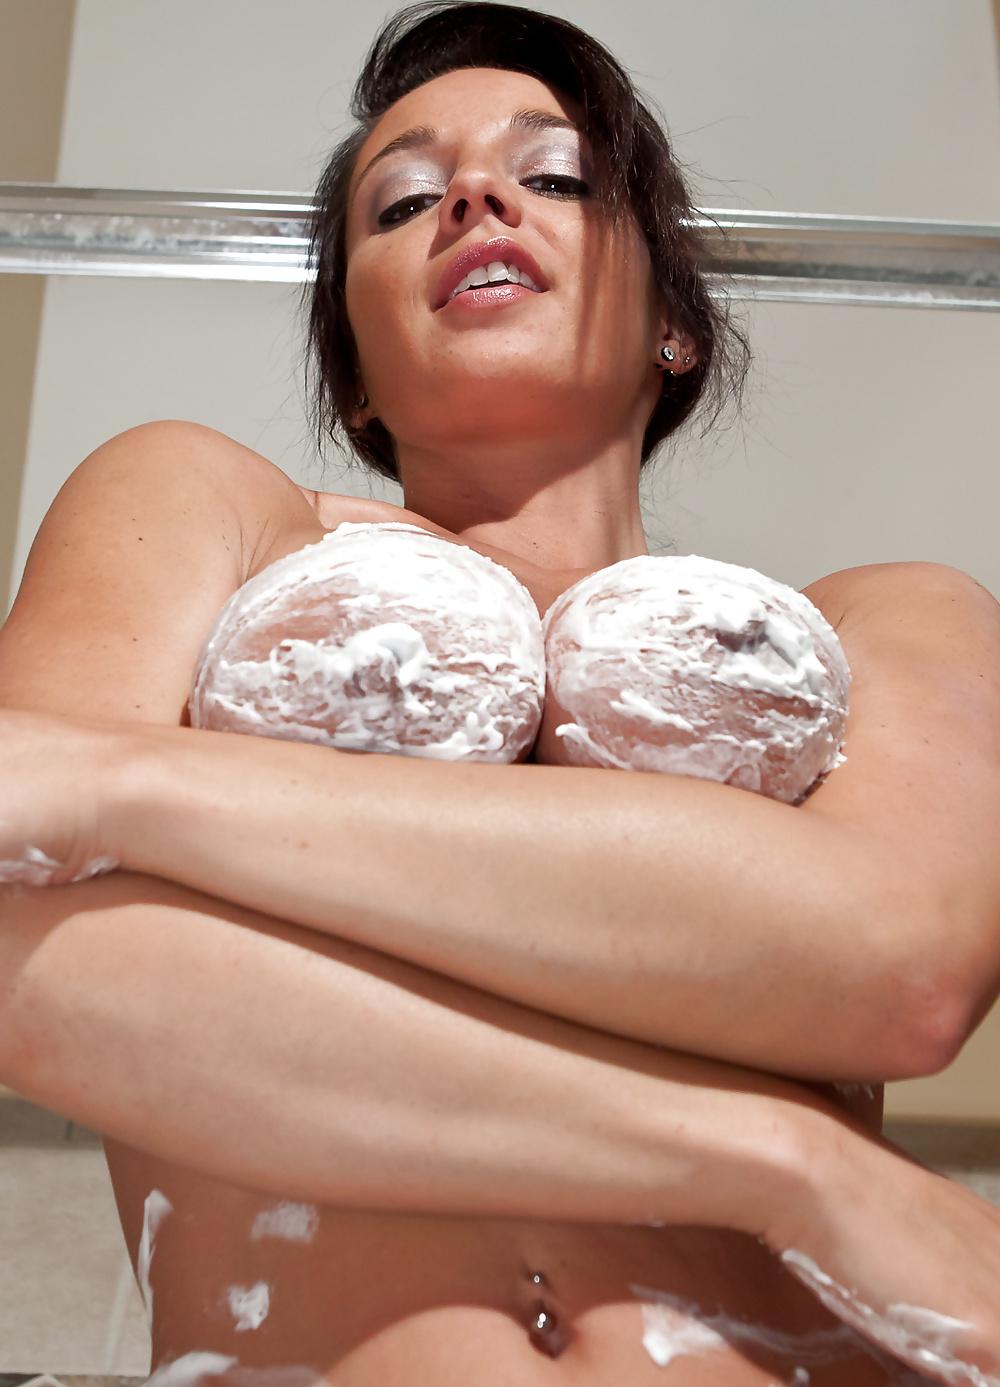 bigger-boob-cream-beautiful-tits-free